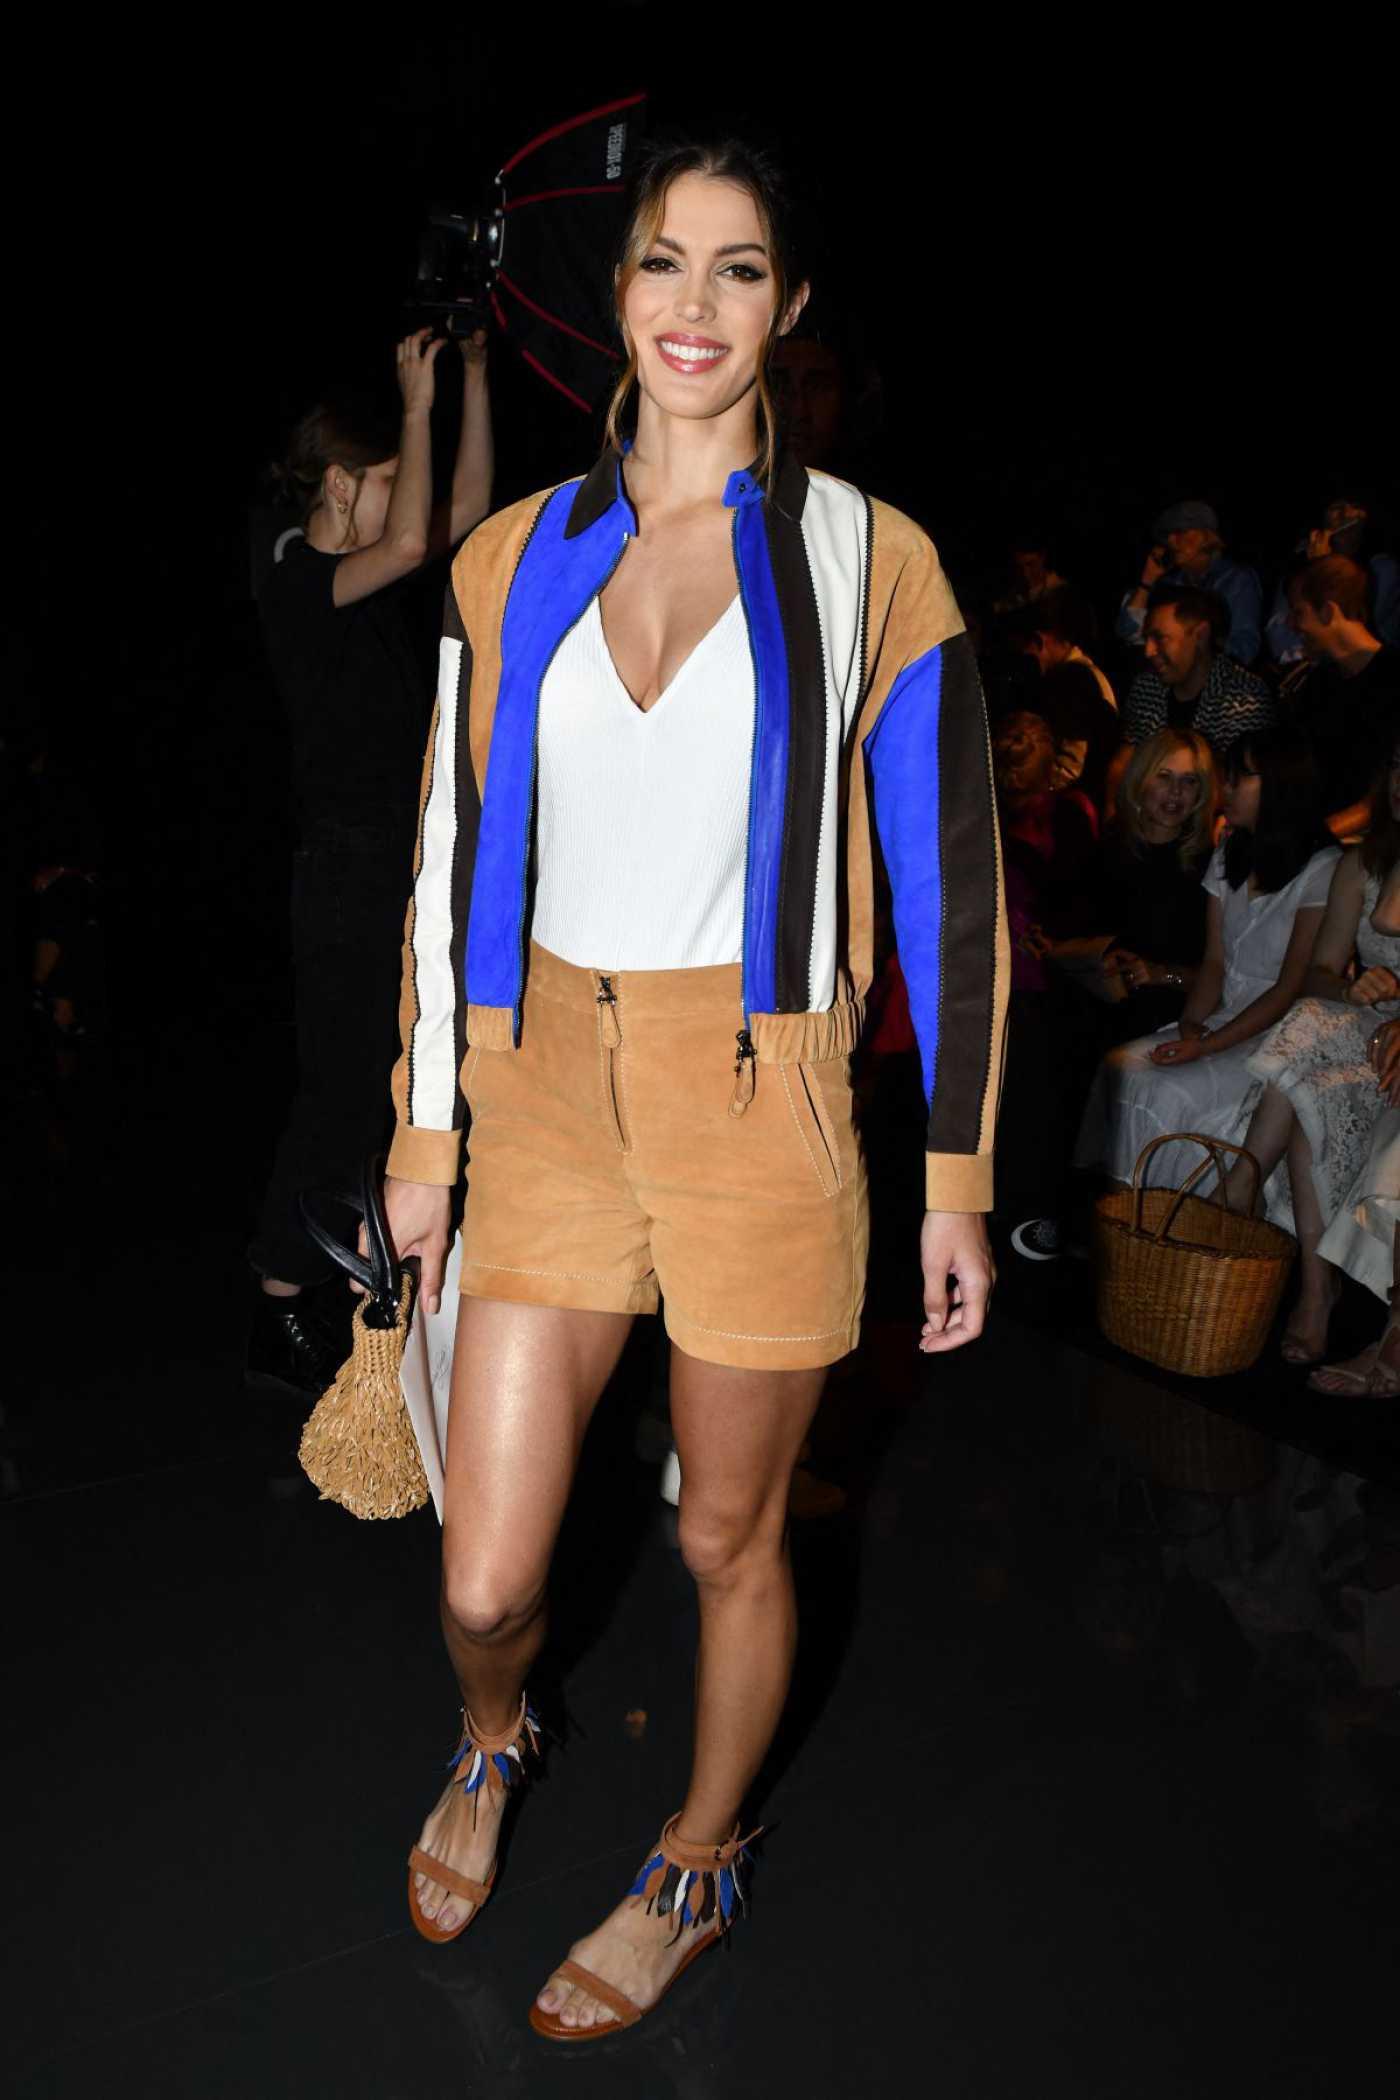 Iris Mittenaere Attends the Schiaparelli Show During 2019 Paris Fashion Week in Paris 07/01/2019